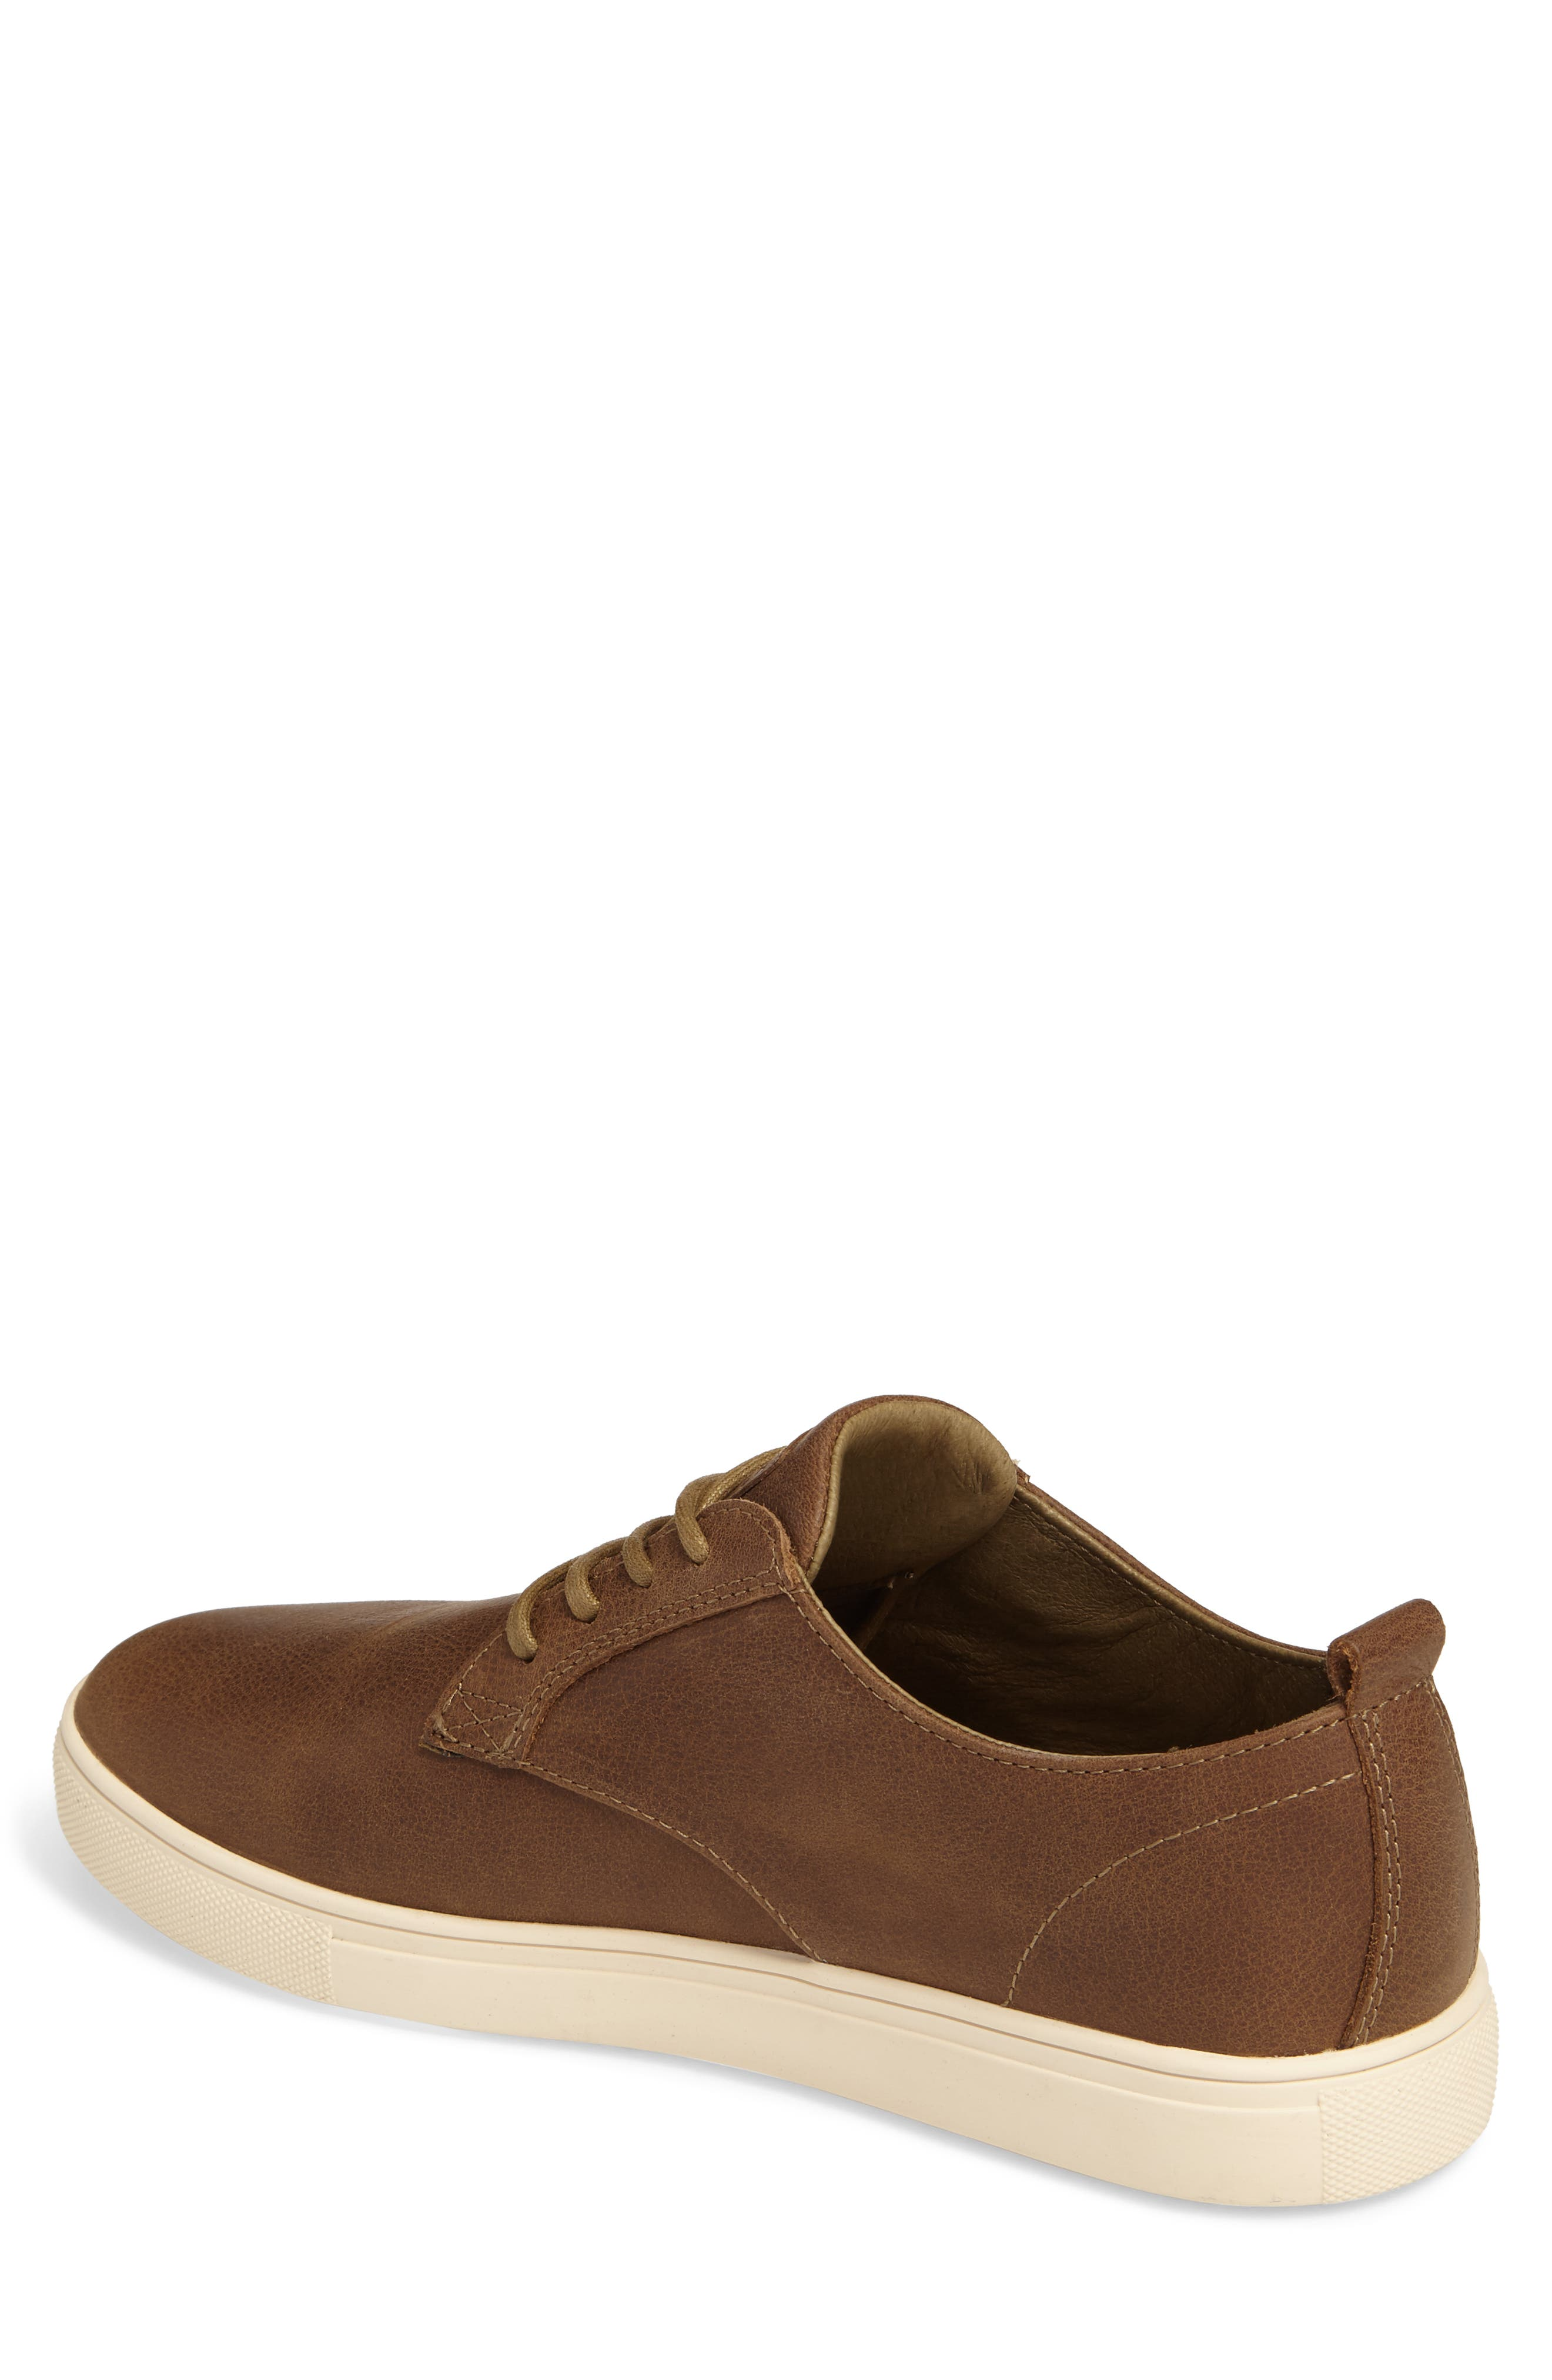 Alternate Image 2  - Clae 'Ellington' Sneaker (Men)